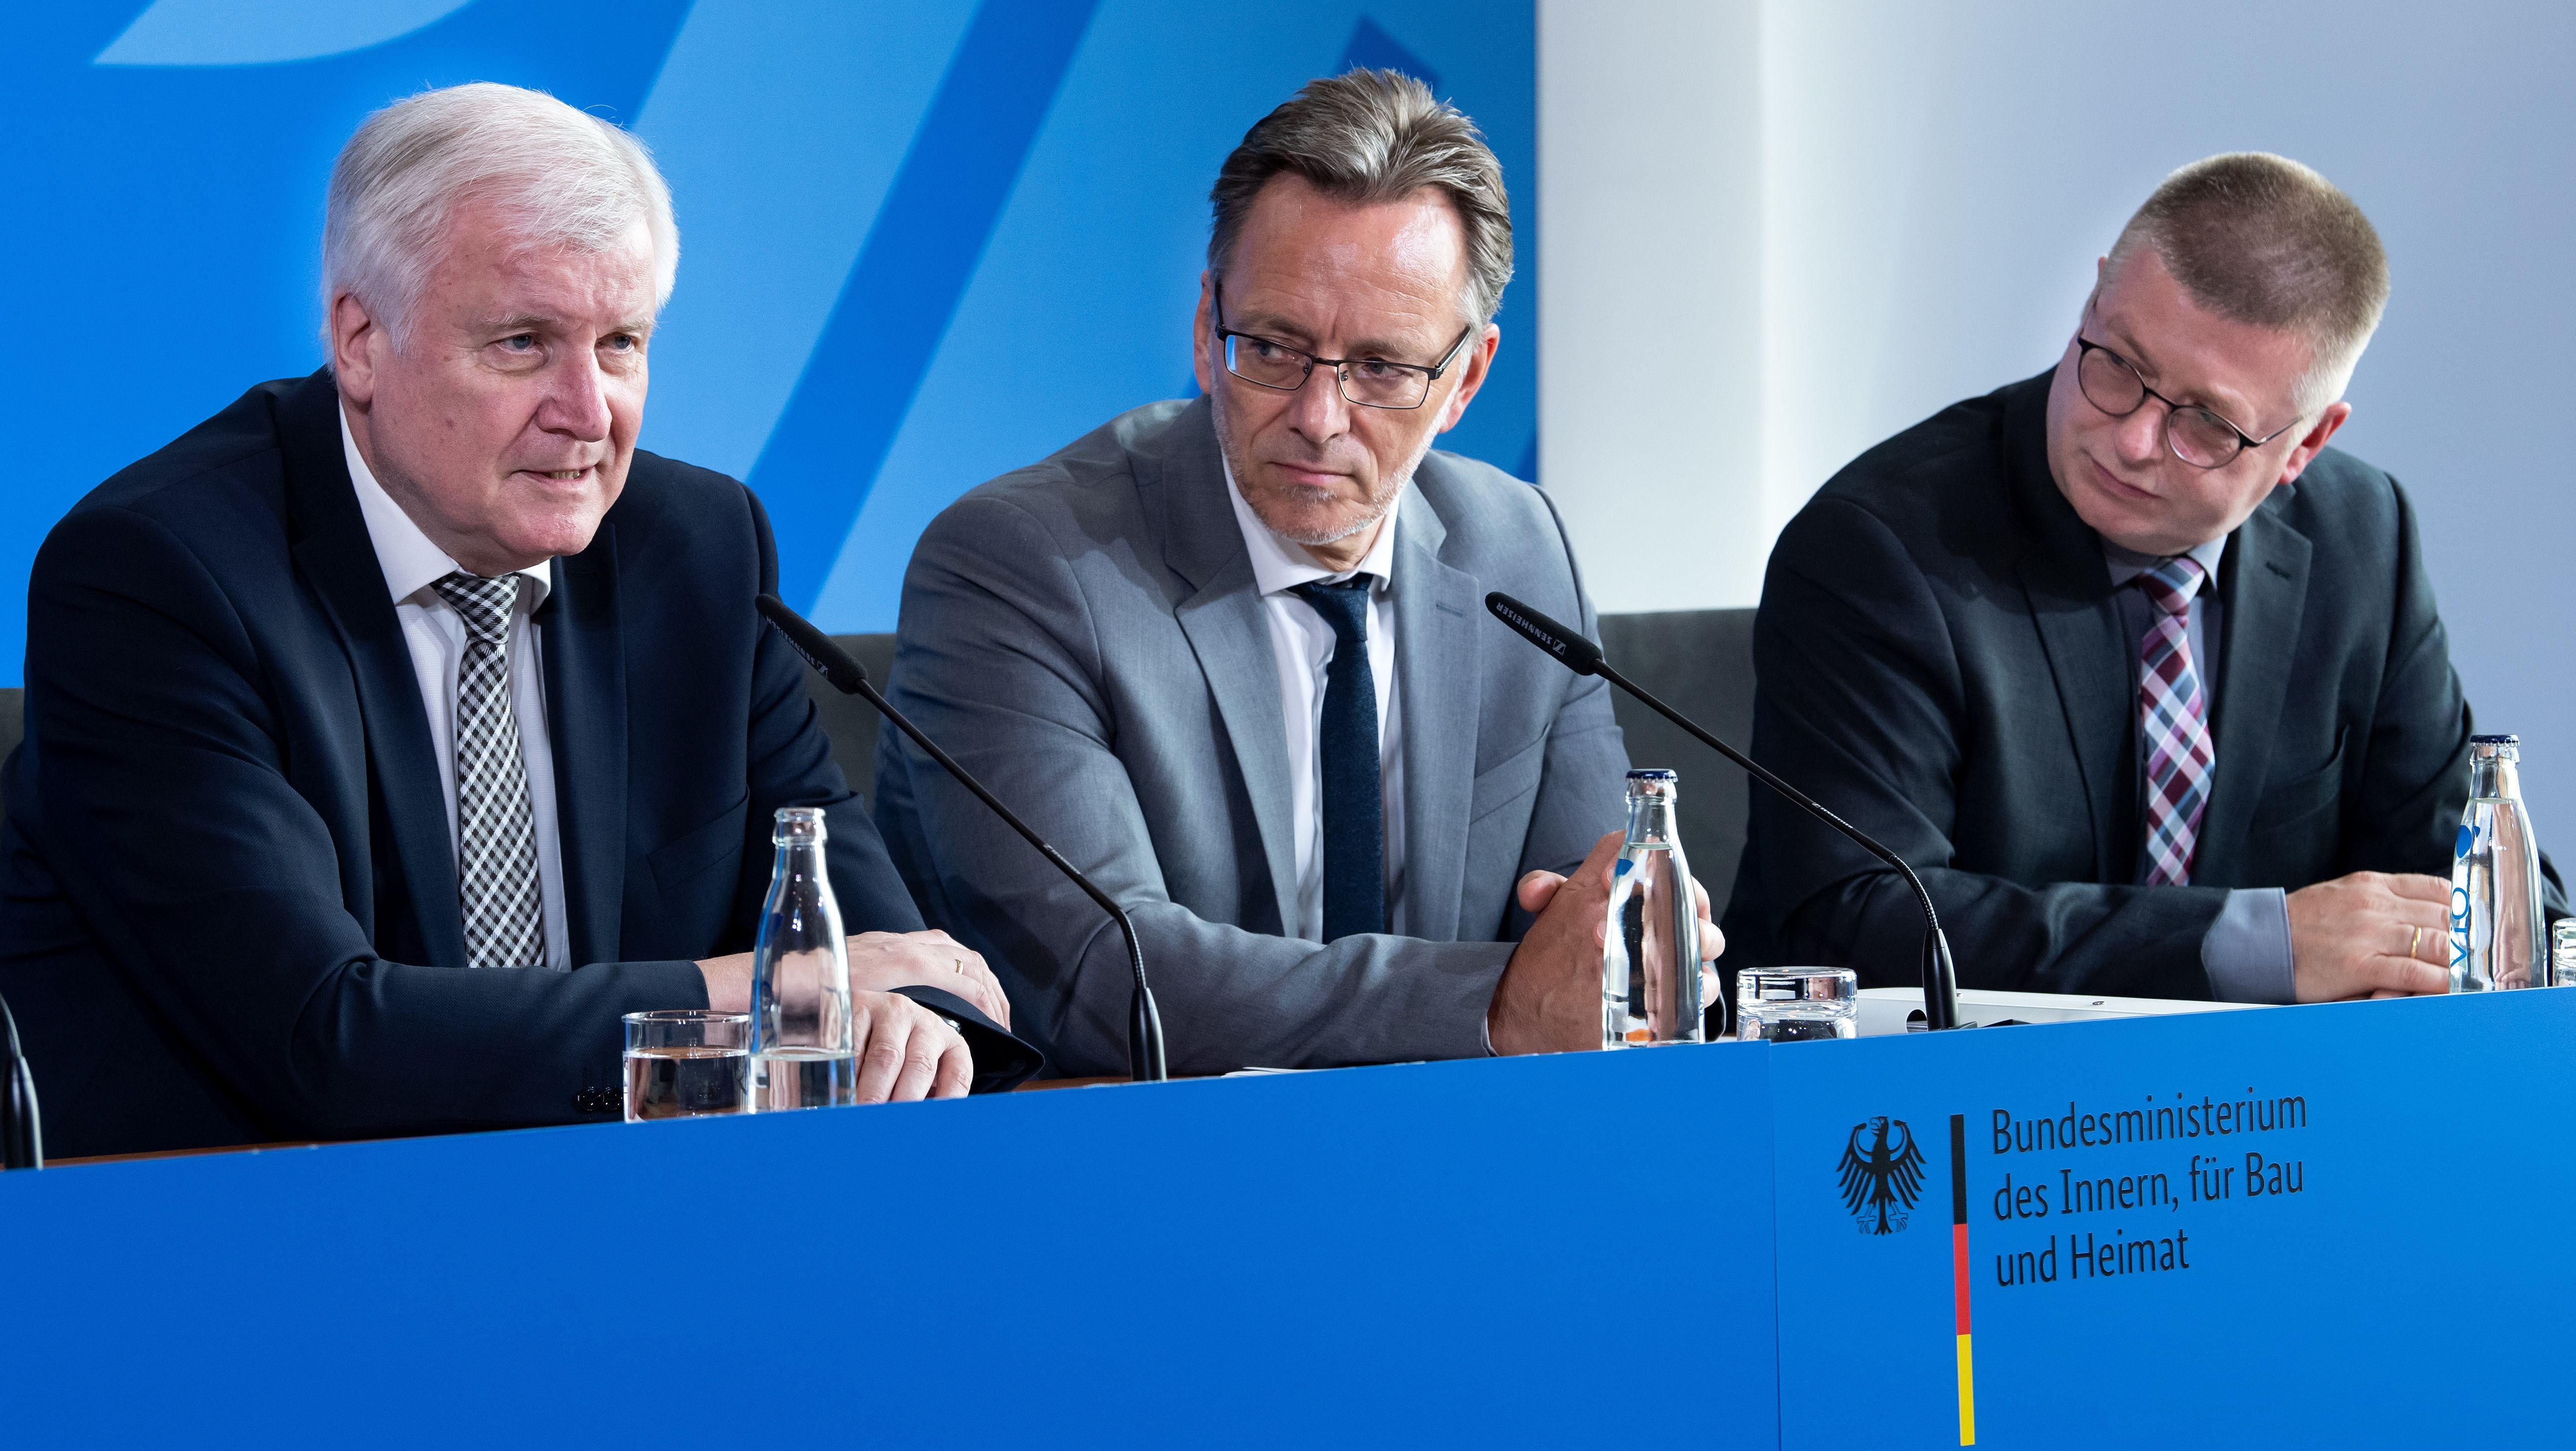 Horst Seehofer (Bundesinnenminister), Holger Münch (Präsident des Bundeskriminalamts) und Thomas Haldenwang (Verfassungsschutzpräsident)